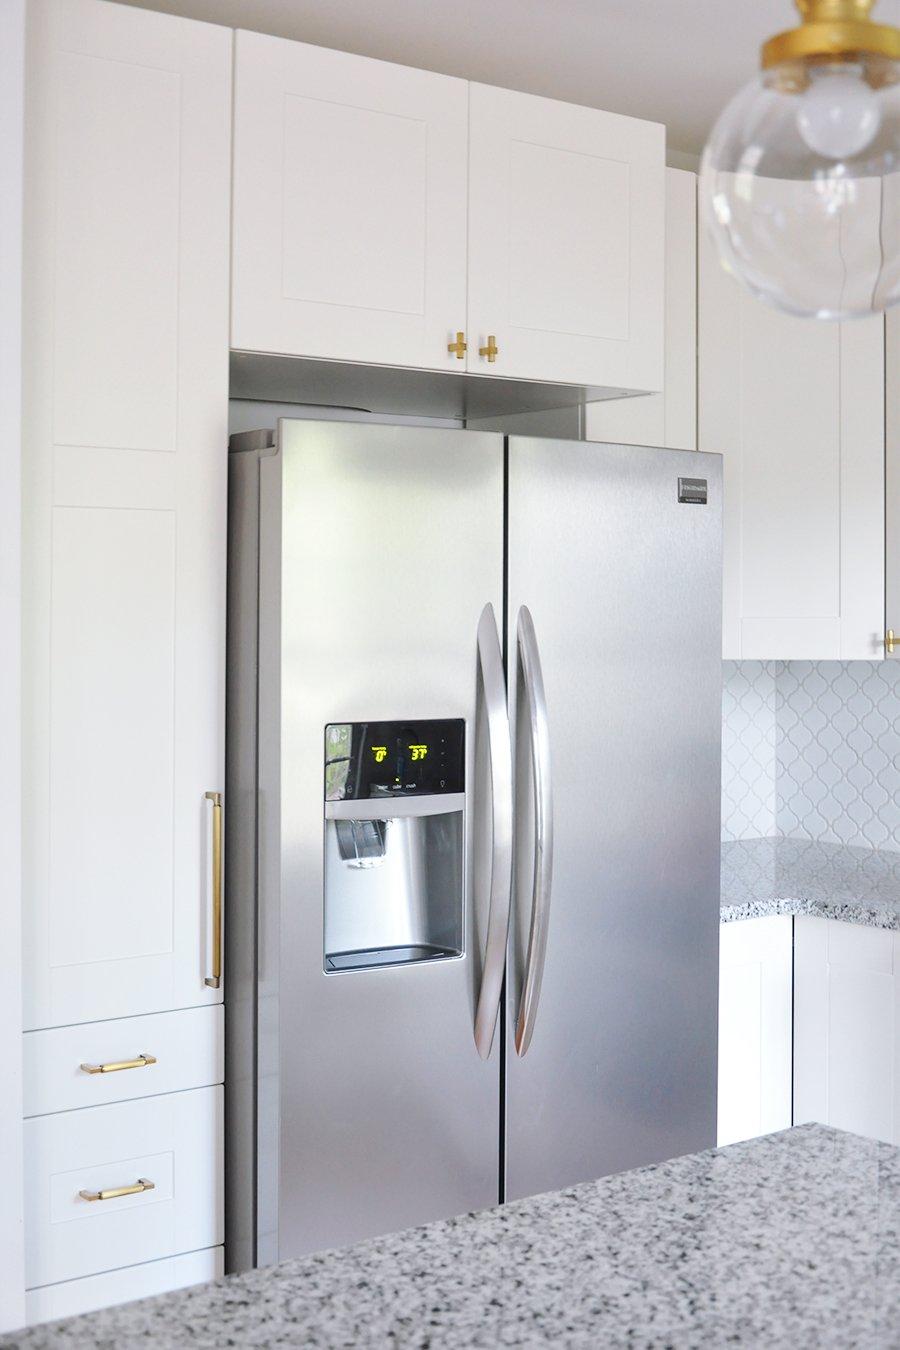 home-renovation-progress-report-kitchen-updates-5